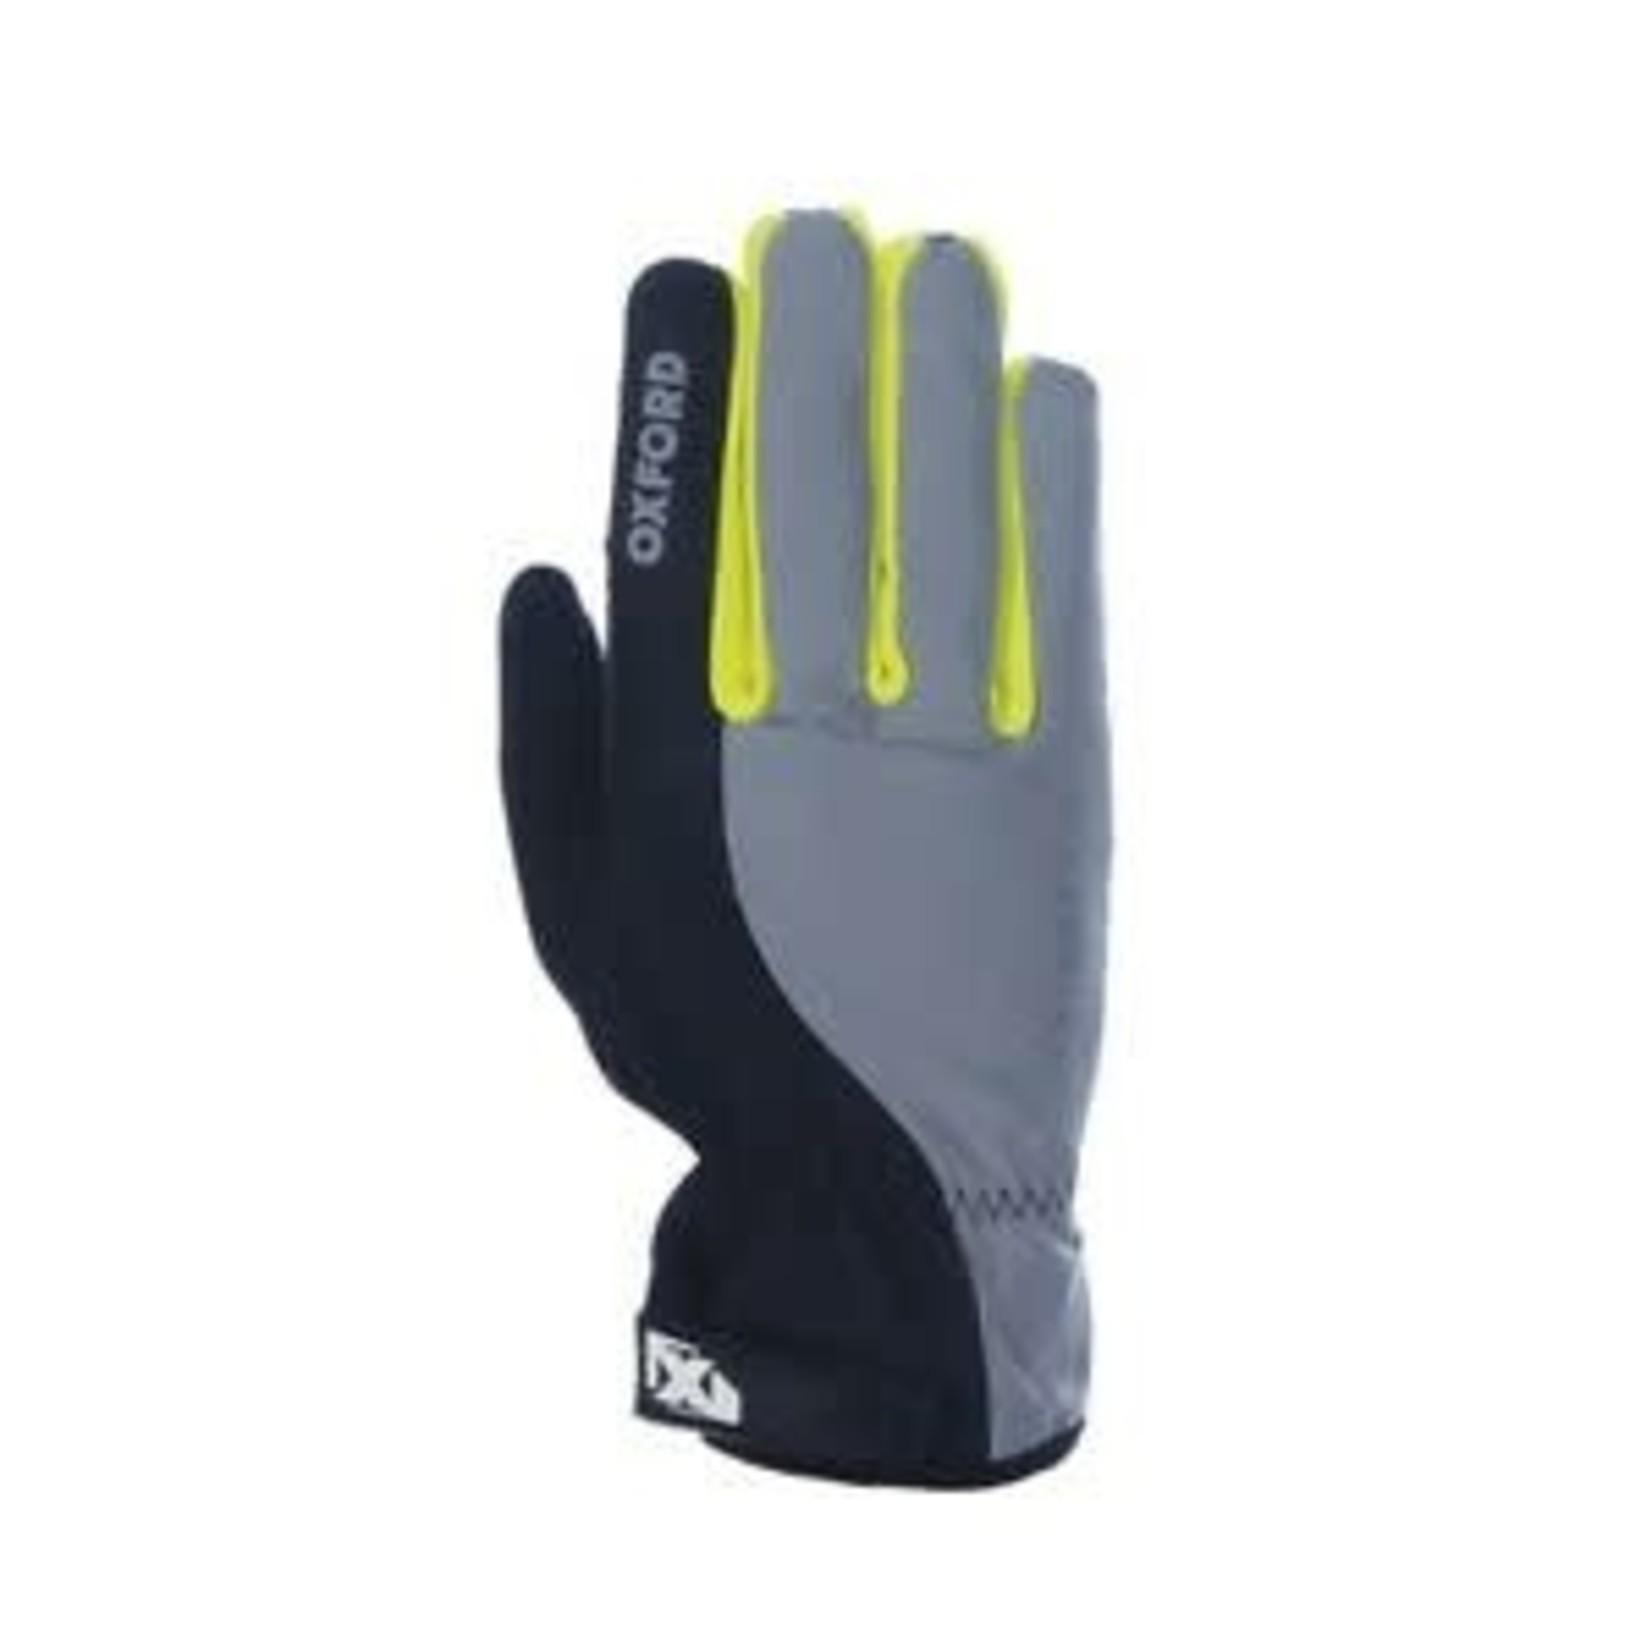 Oxford Bright Gloves 3.0 Black